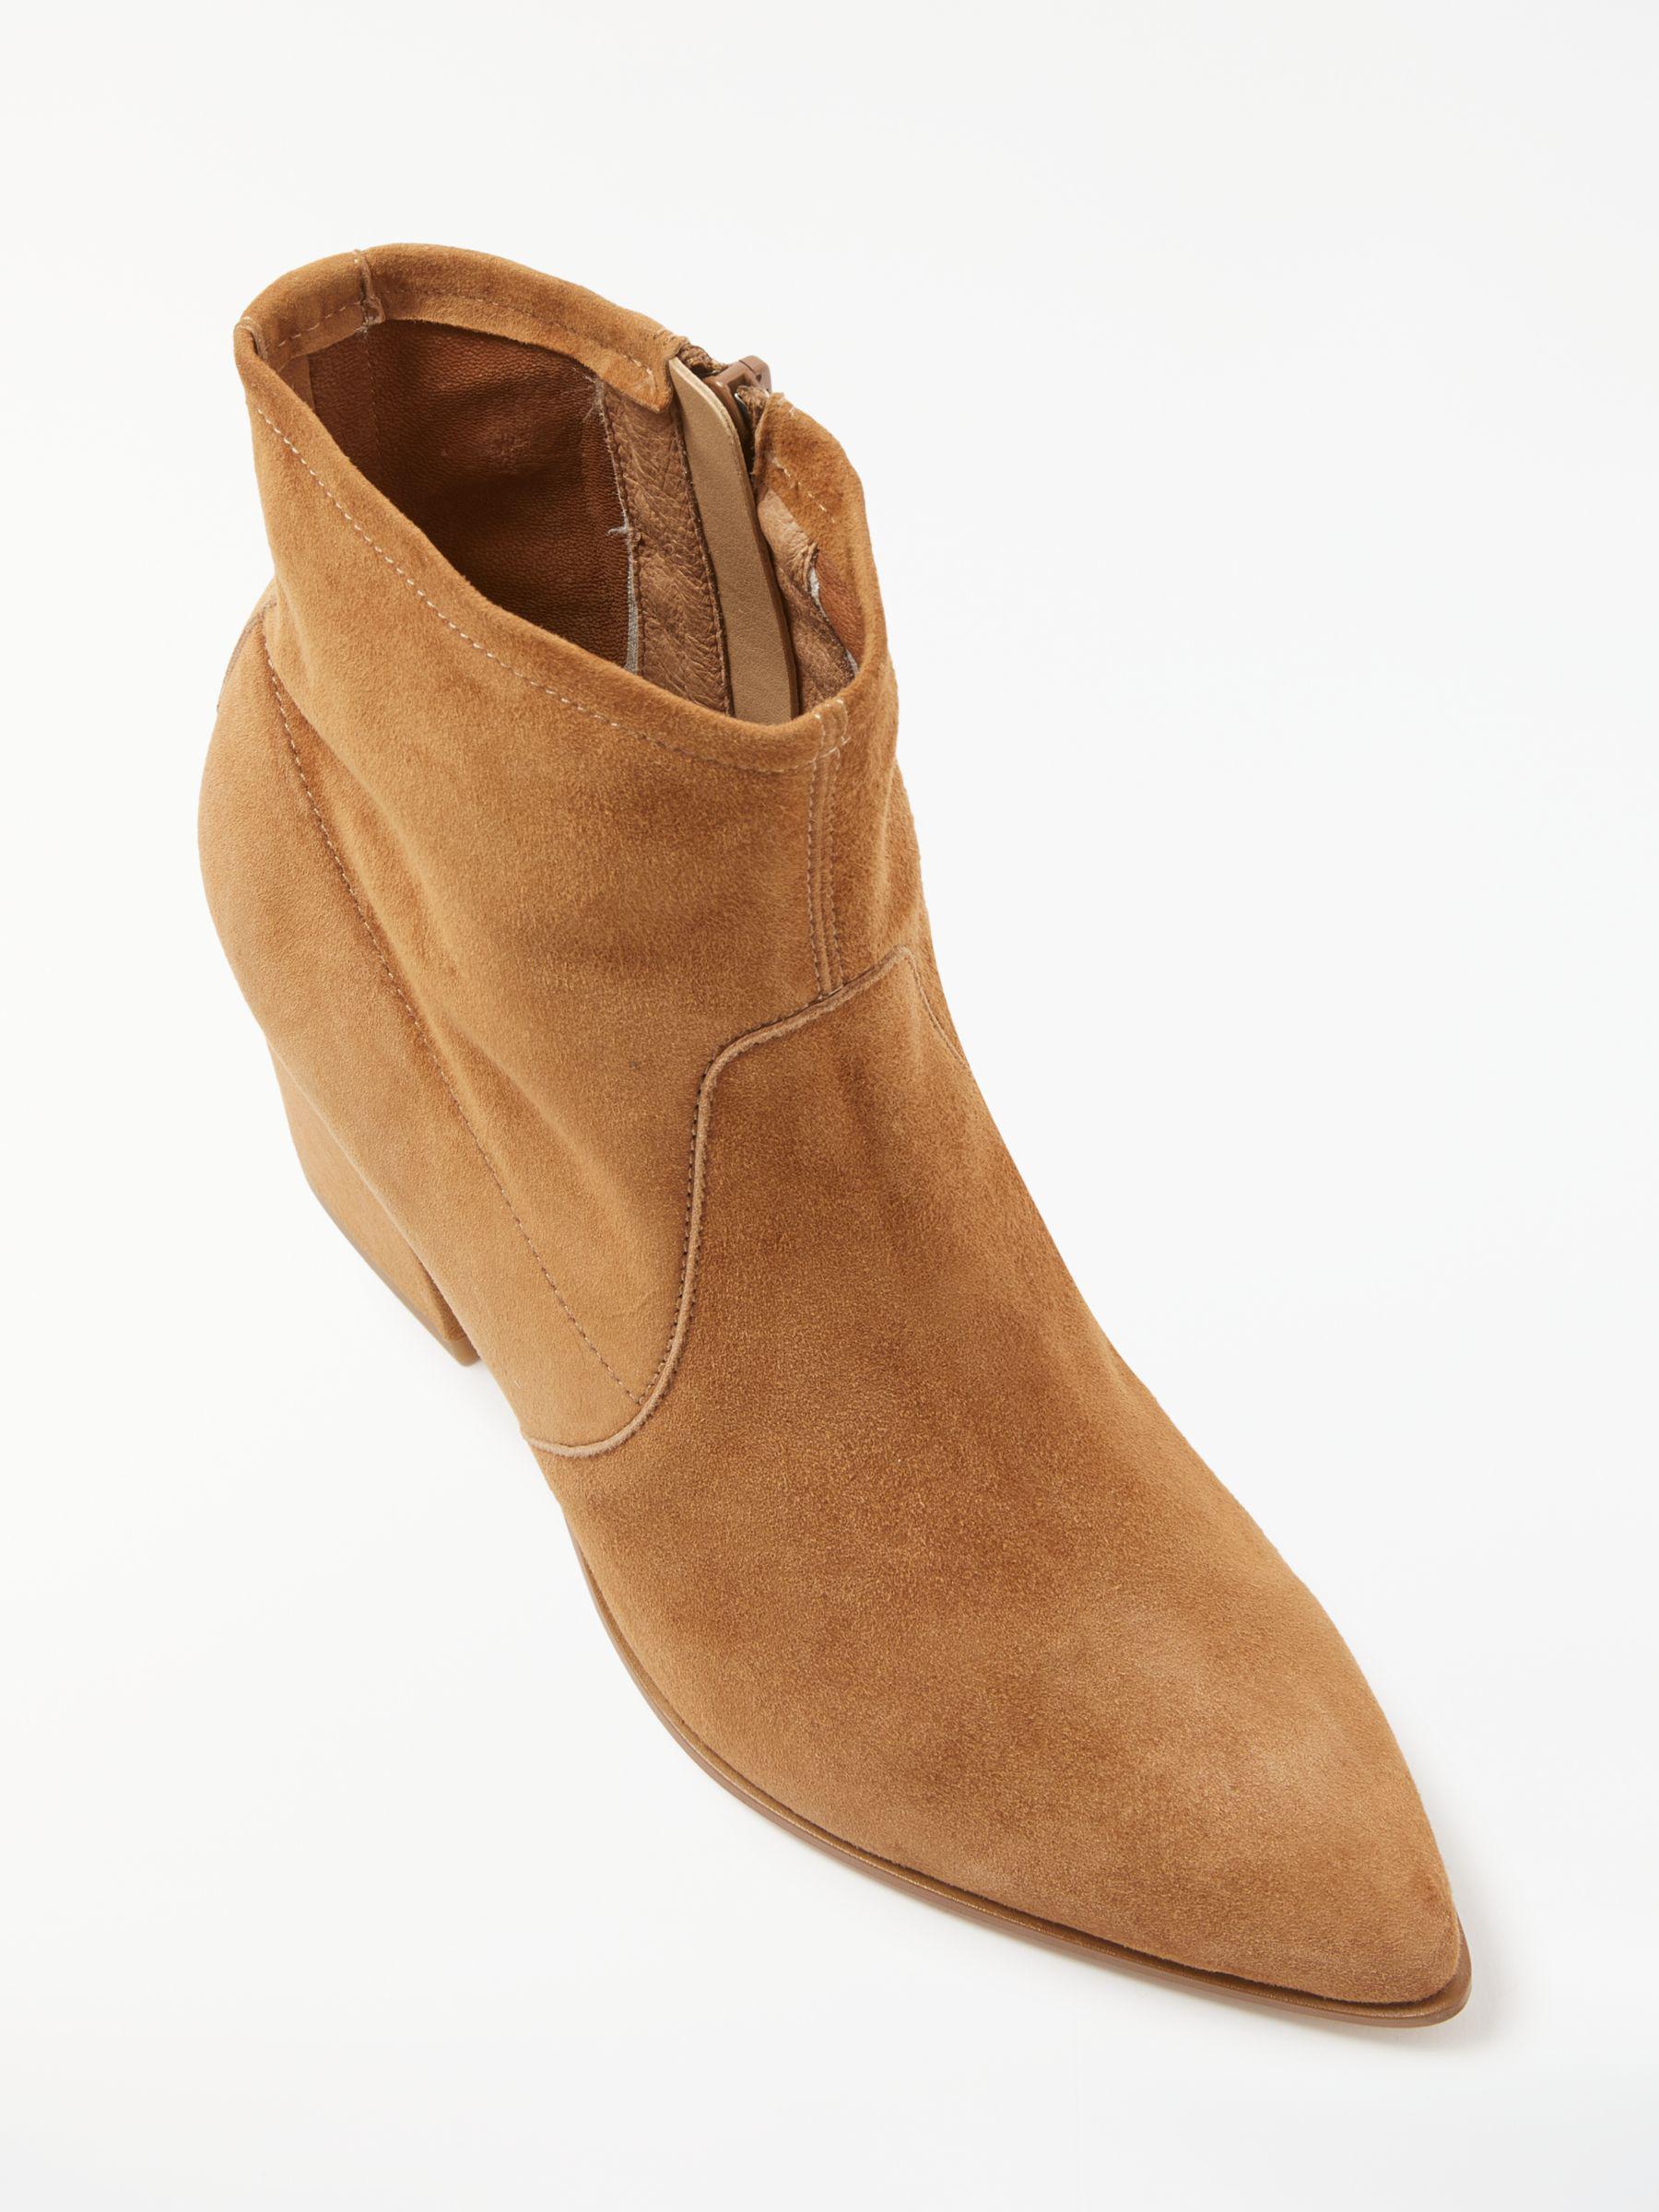 Modern Rarity Suede Orsino Block Heeled Boots in Tan (Brown)